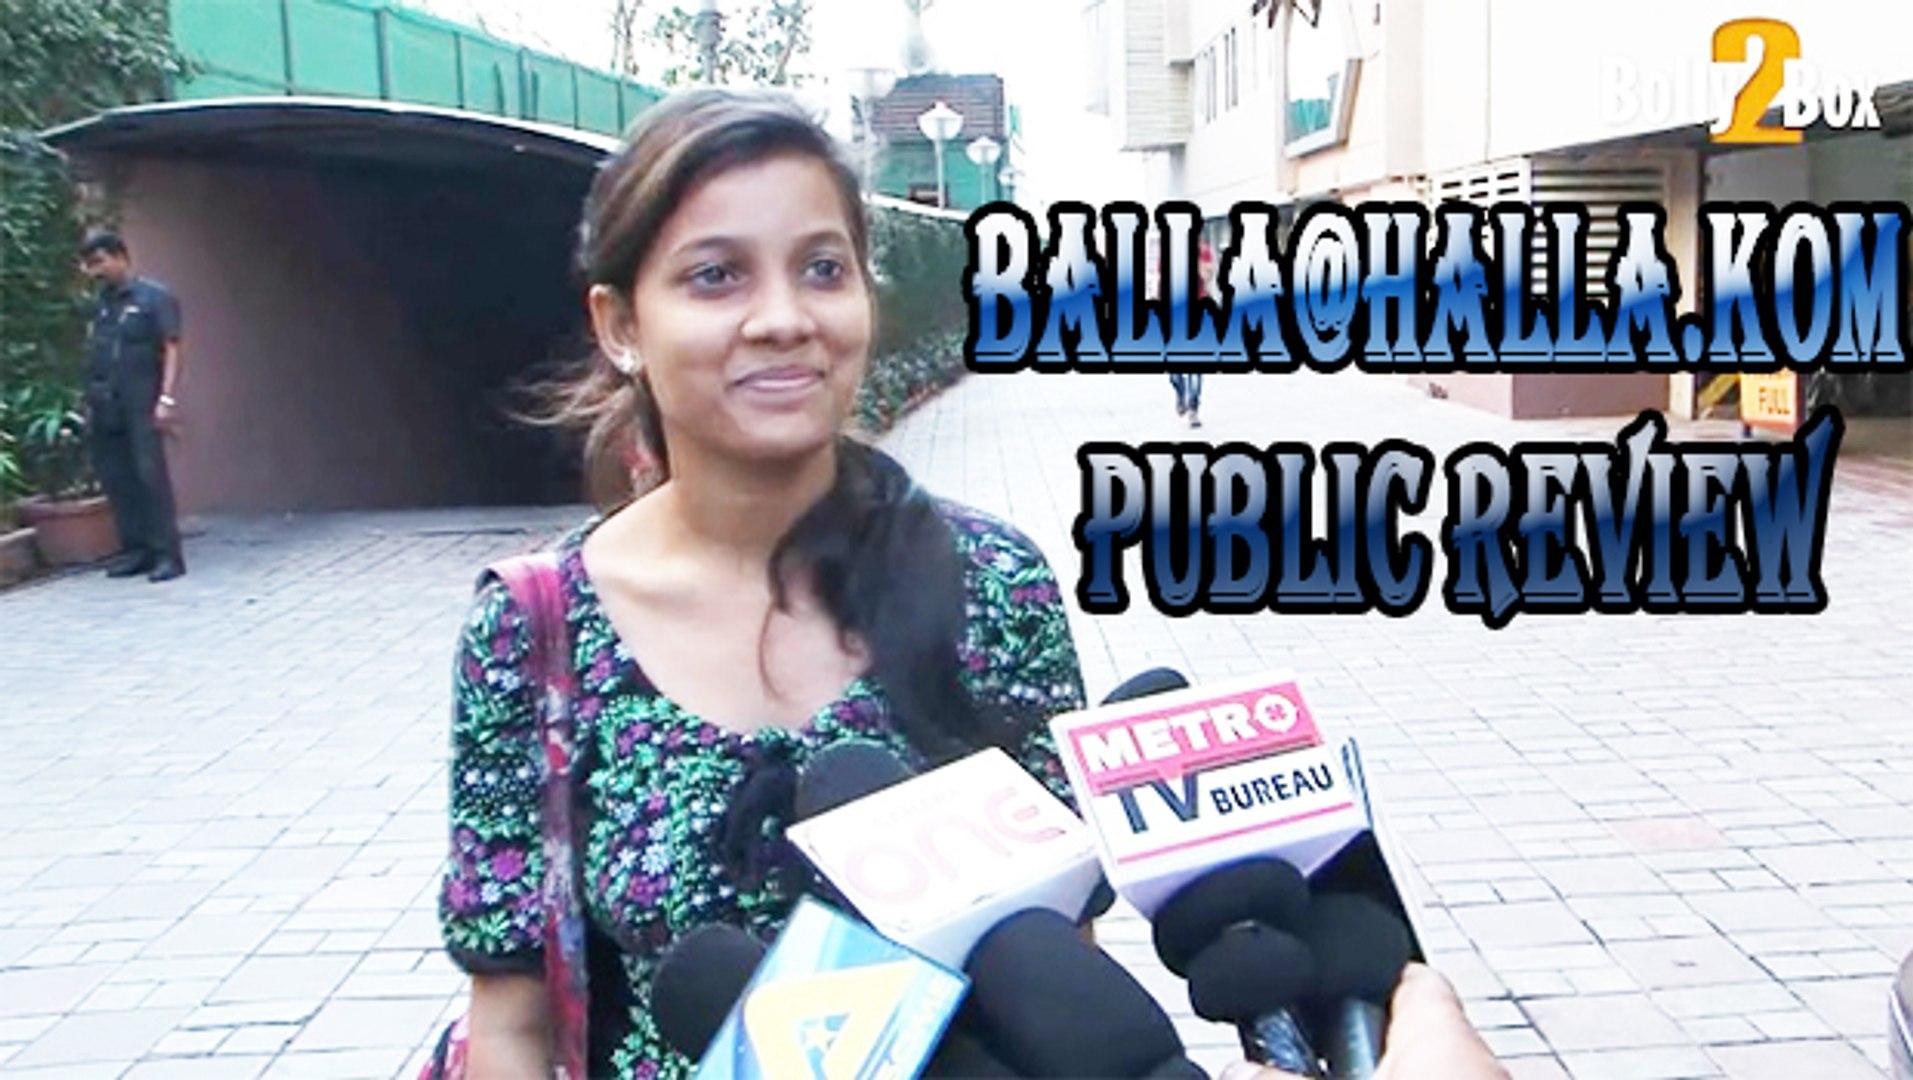 Balla@Halla.Kom Public Review | Bollywood Movie Balla@Halla.Kom